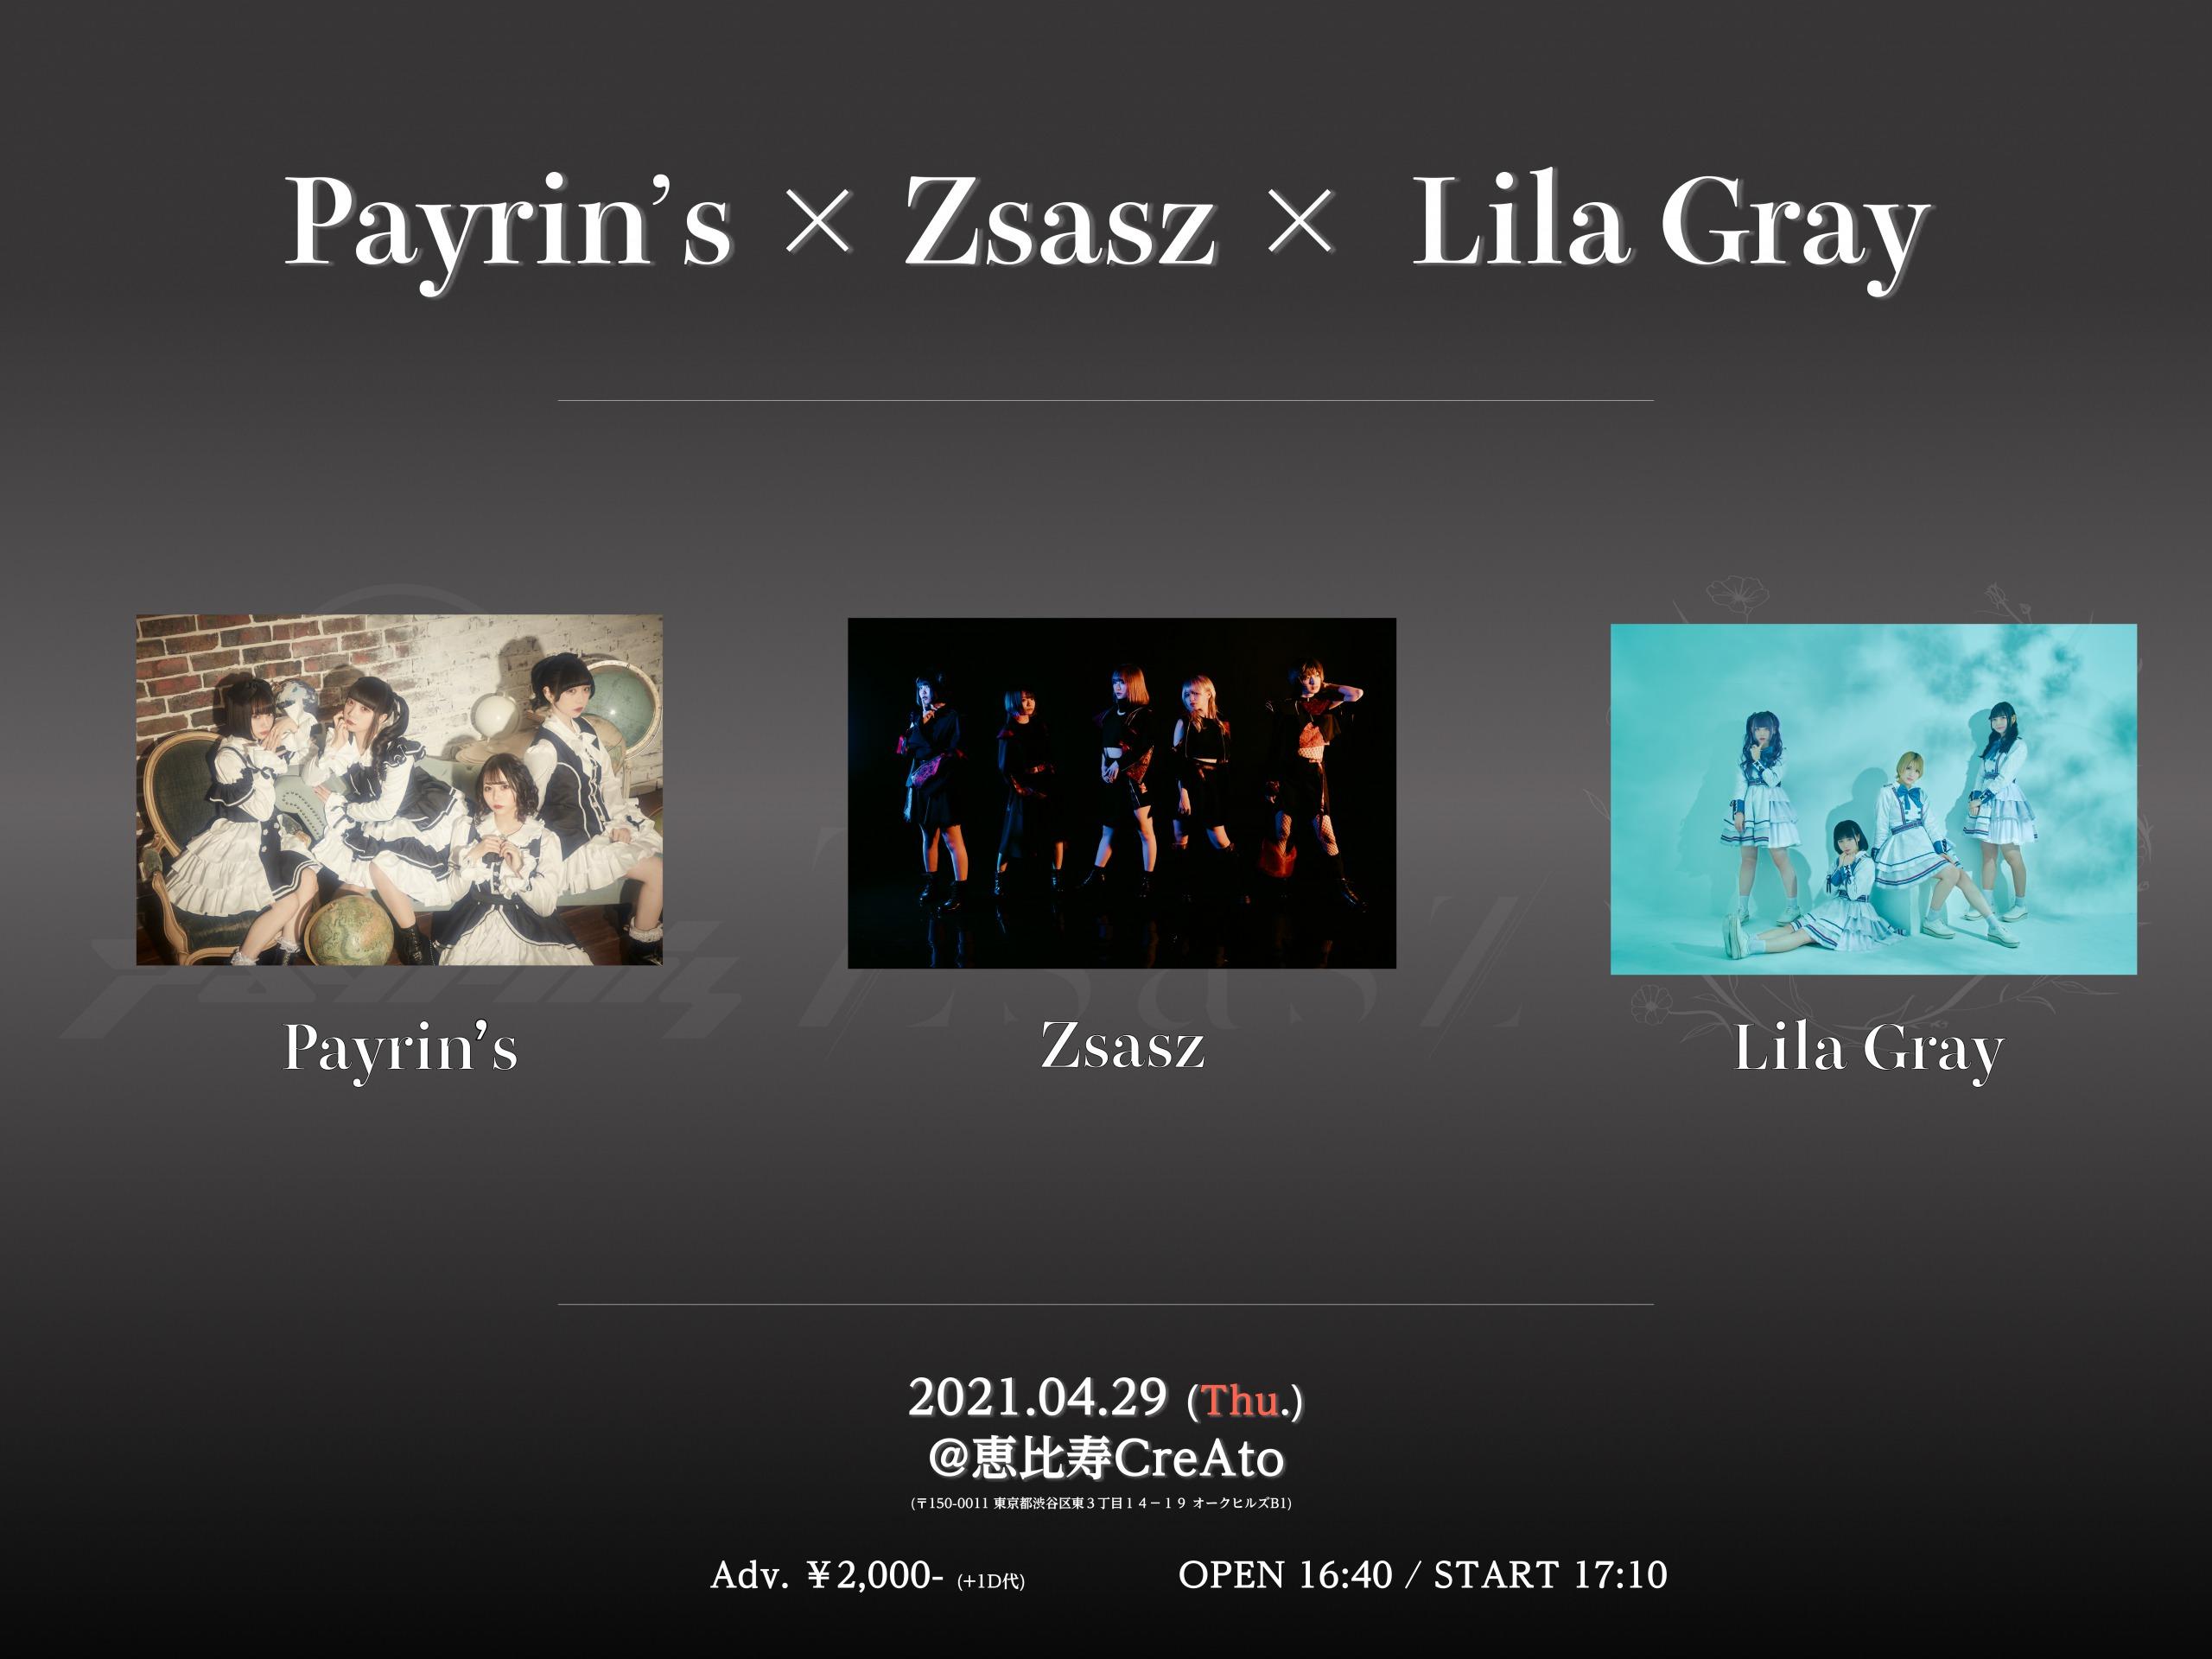 Payrin's × Zsasz × Lila Gray